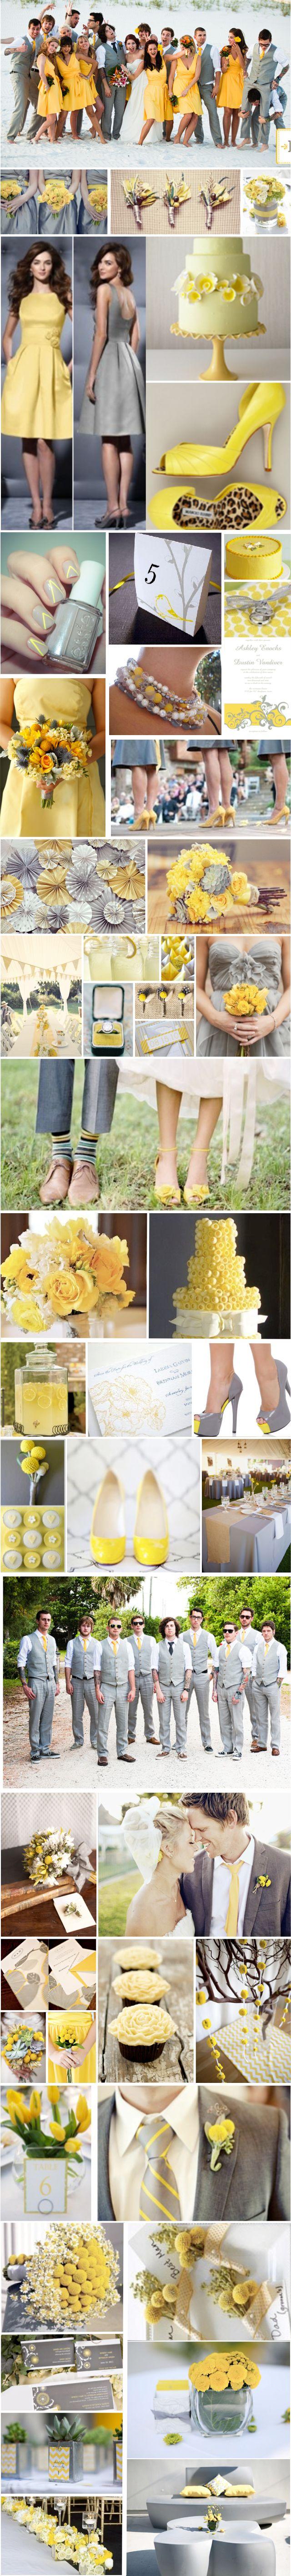 wedding inspiration: gray and yellow